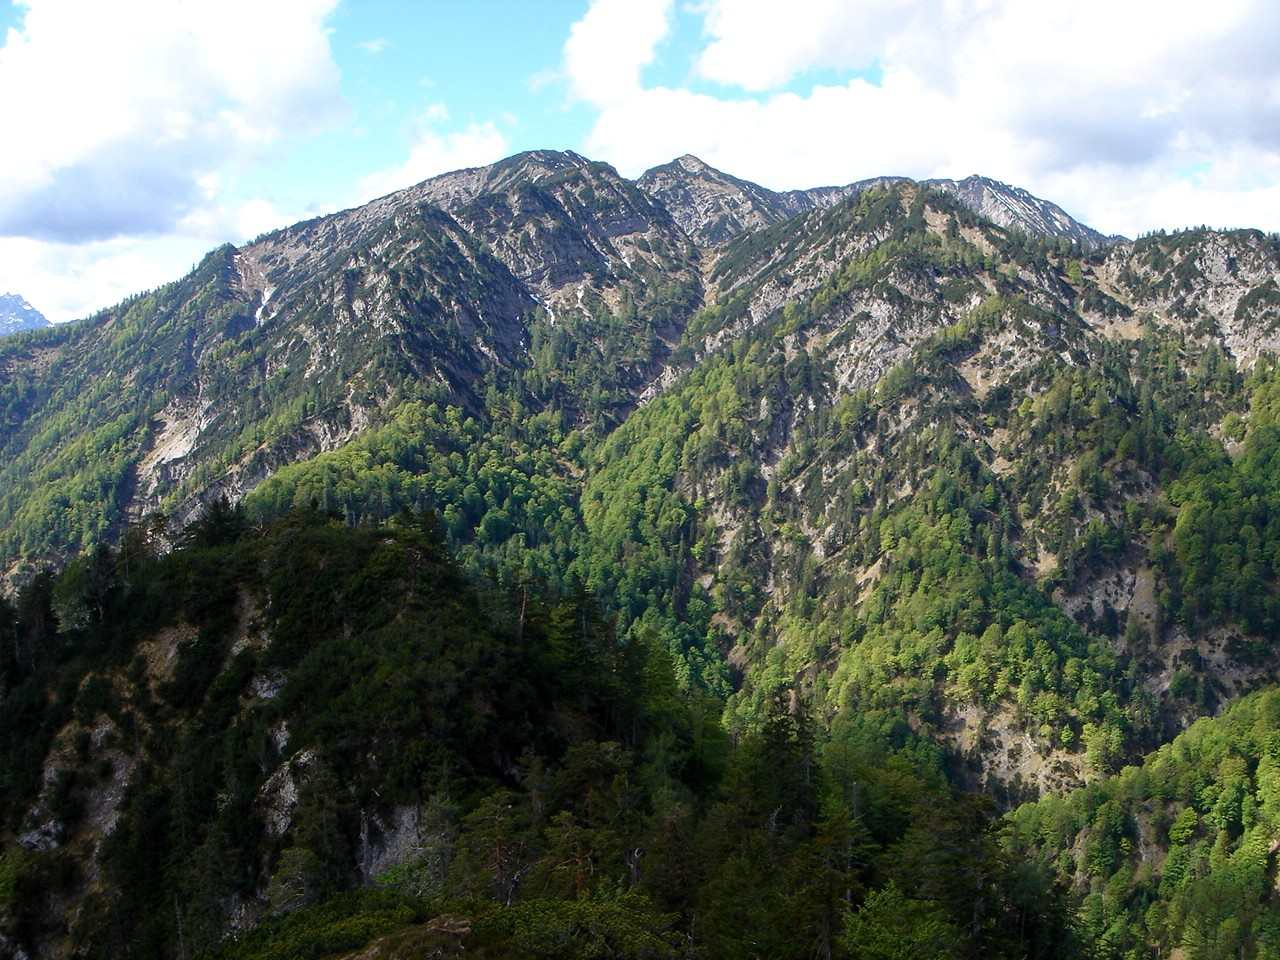 Foto: Manfred Karl / Mountainbiketour / Saurüsselkopf (1270m) / Blick gegen Kreuzschneid, Wildalphorn, Dürrnbachhorn / 16.06.2007 09:49:51